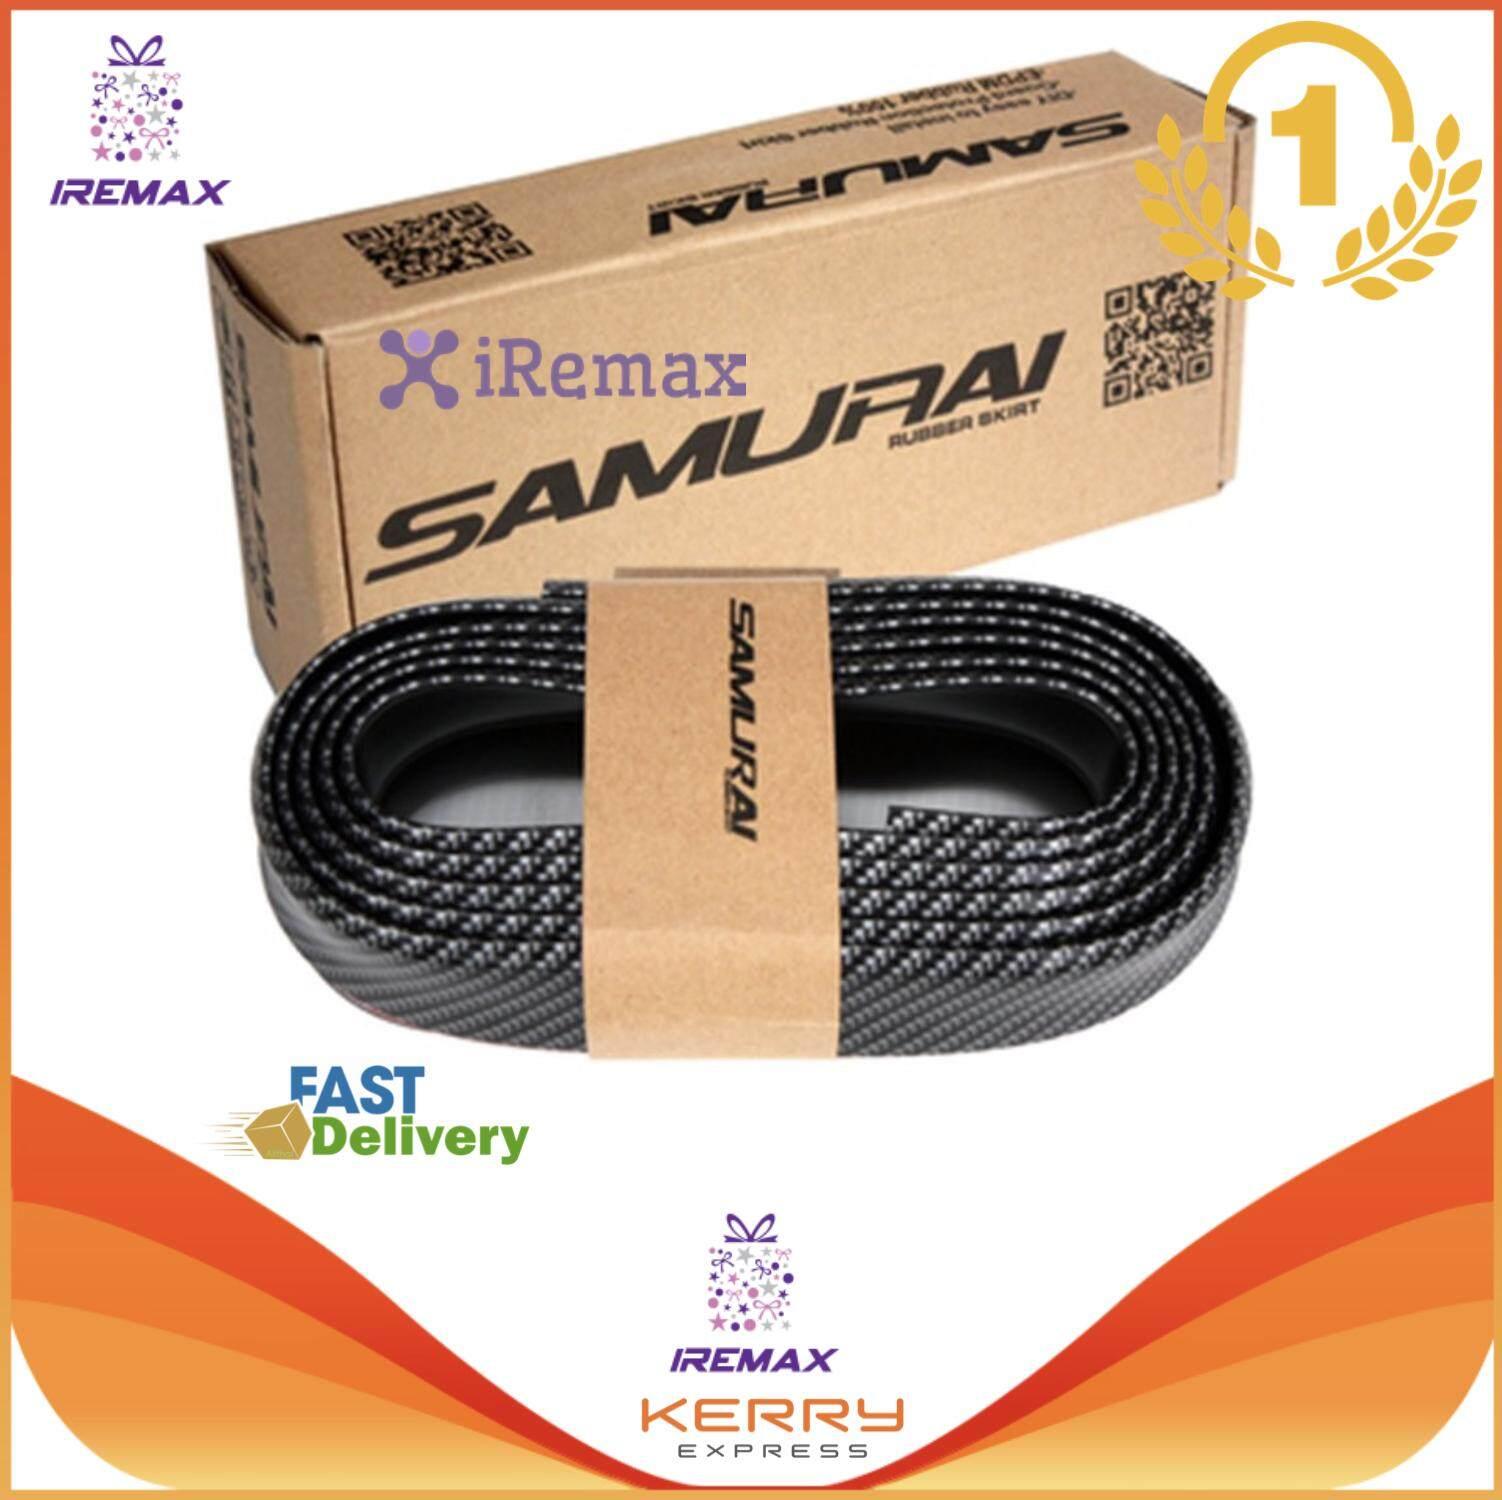 Iremax ลิ้นยาง สเกริตหน้า Lip Skirt ยางกันกระแทก ลิ้นหน้า ความยาว 2.5 เมตร ลิ้นซิ่ง สไตล์ ญี่ปุ่น มีกาว 2 หน้า พร้อมติดตั้ง (carbon Black-S) By Iremax.